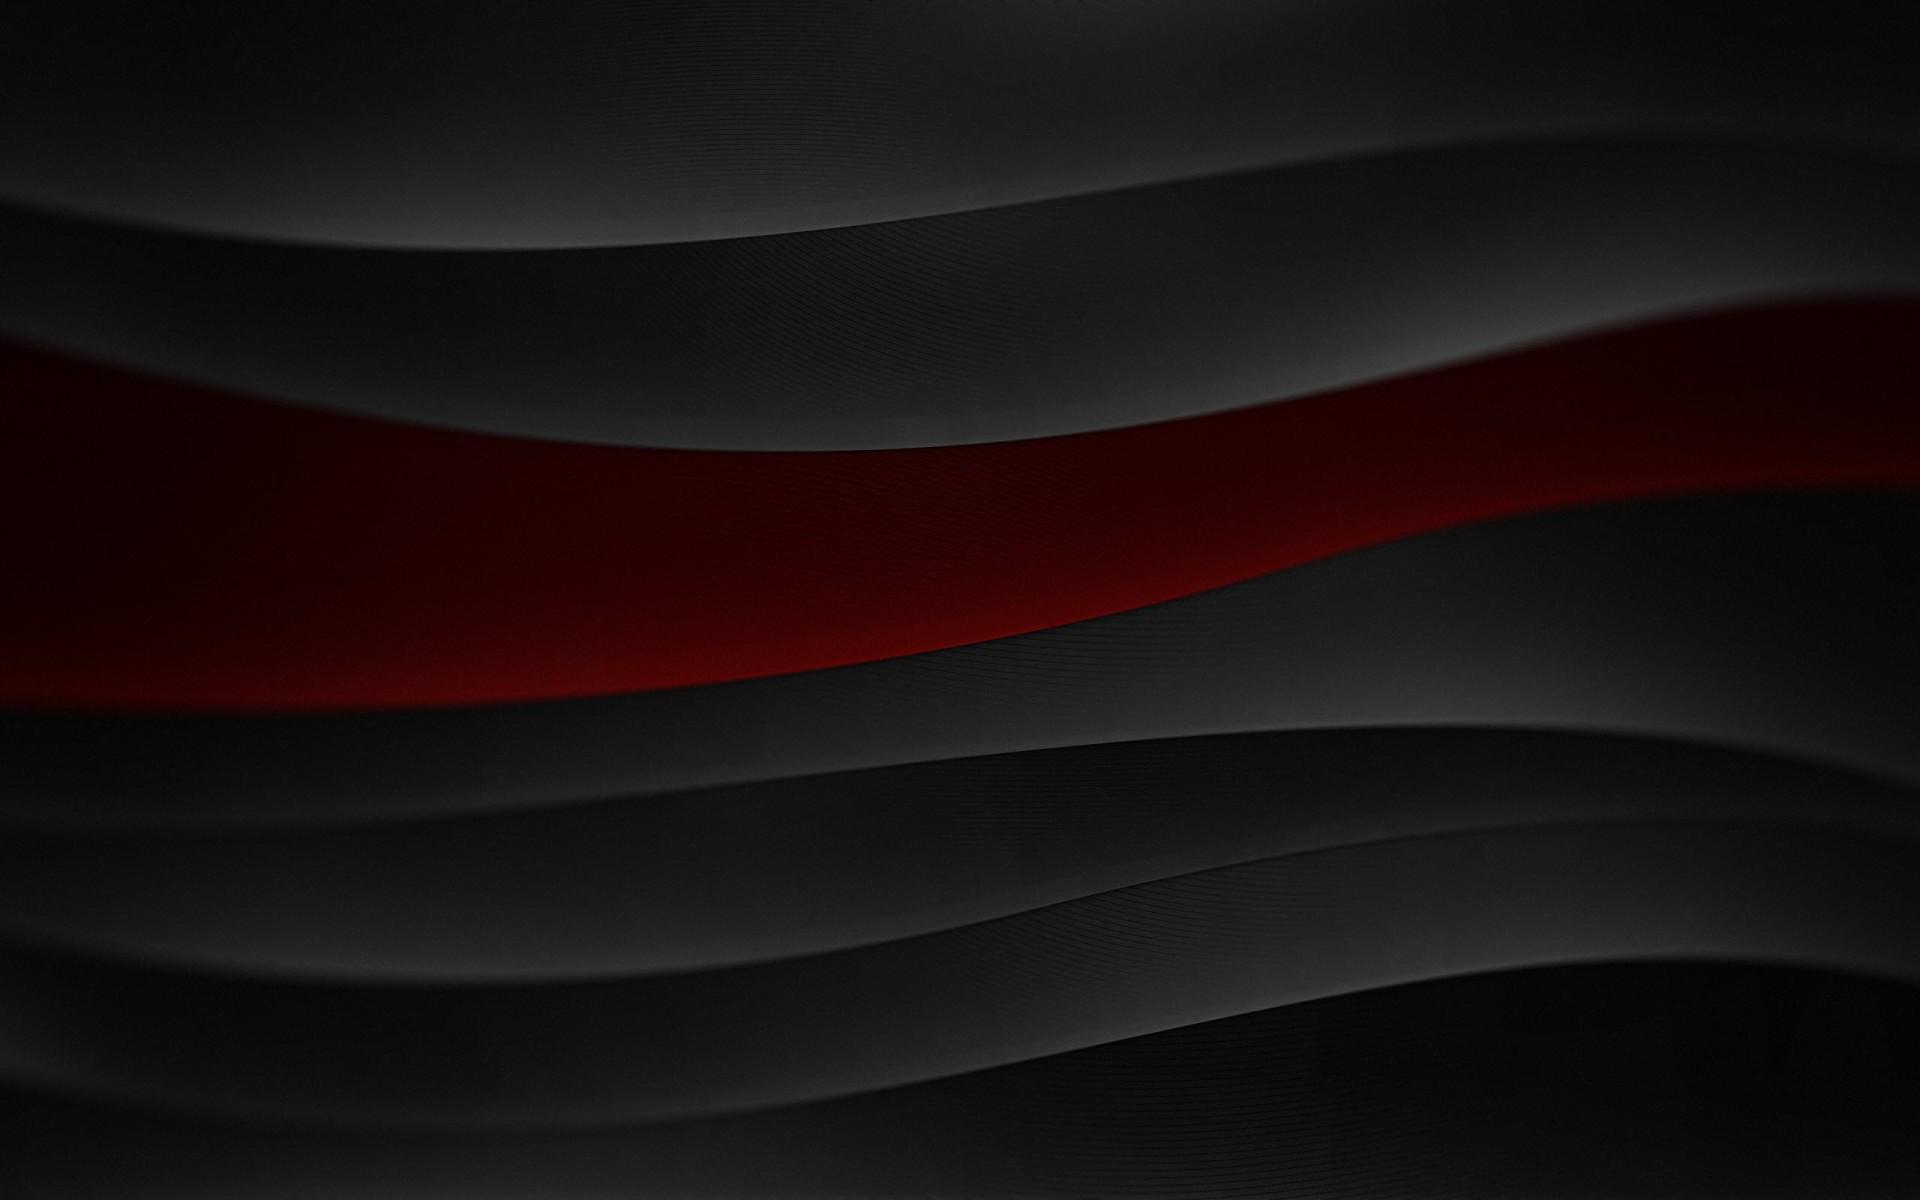 Black And Red Backgrounds   PixelsTalk.Net